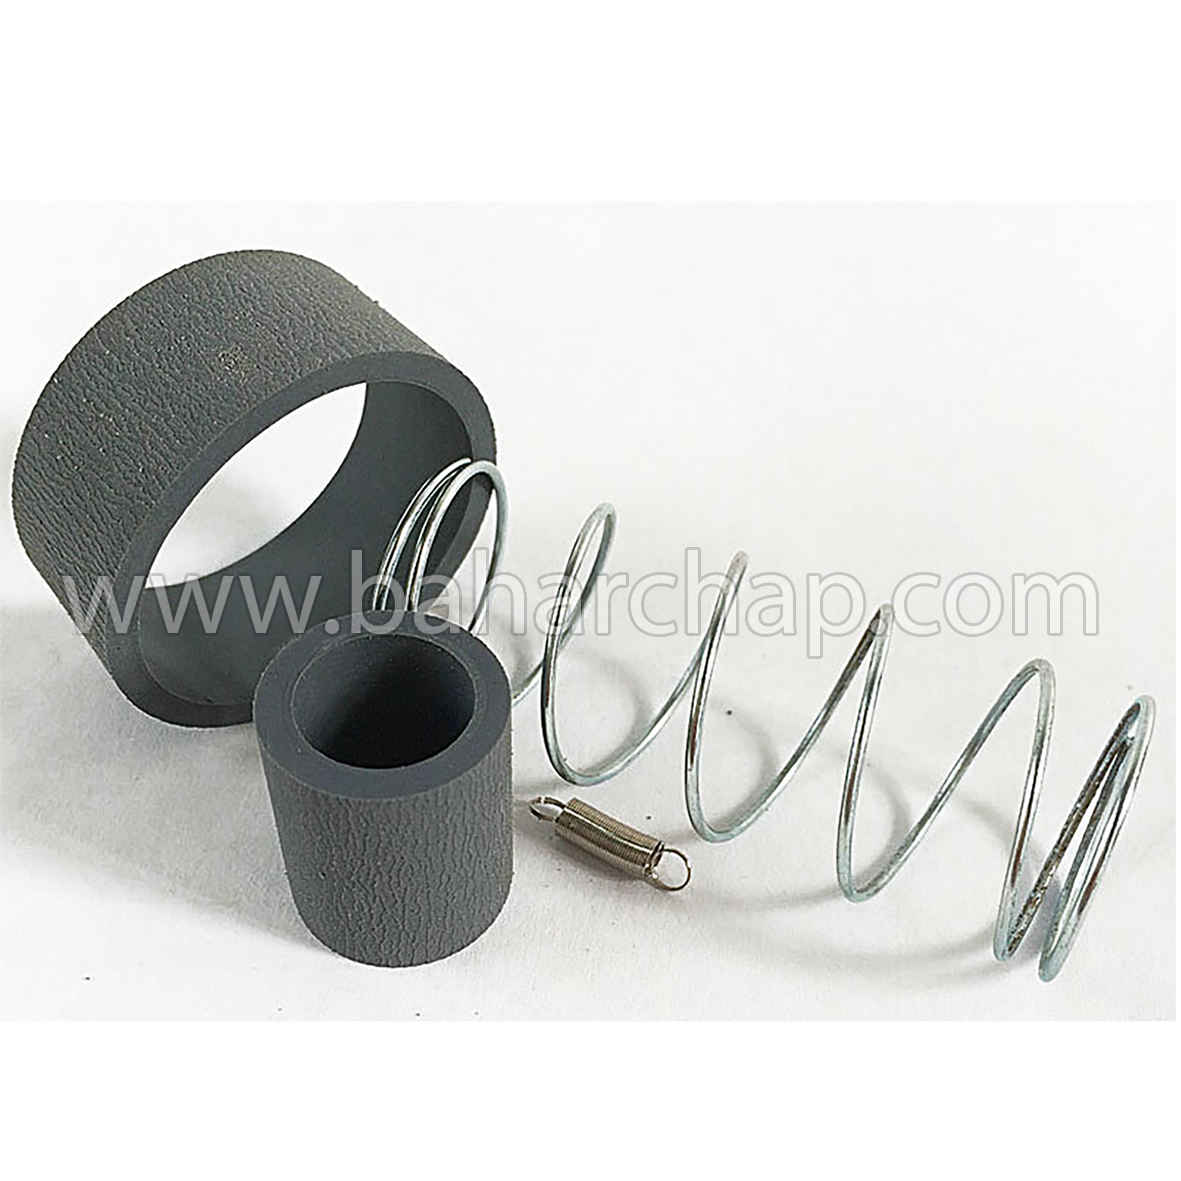 فروشگاه و خدمات اینترنتی بهارچاپ اصفهان-کاغذ کش اصلی اپسون T50 P50 T59 T60 L801 R330 - Printer Paper Pickup Roller Compatible for Epson T50 P50 T59 T60 L801 R330 Pickup Rollers